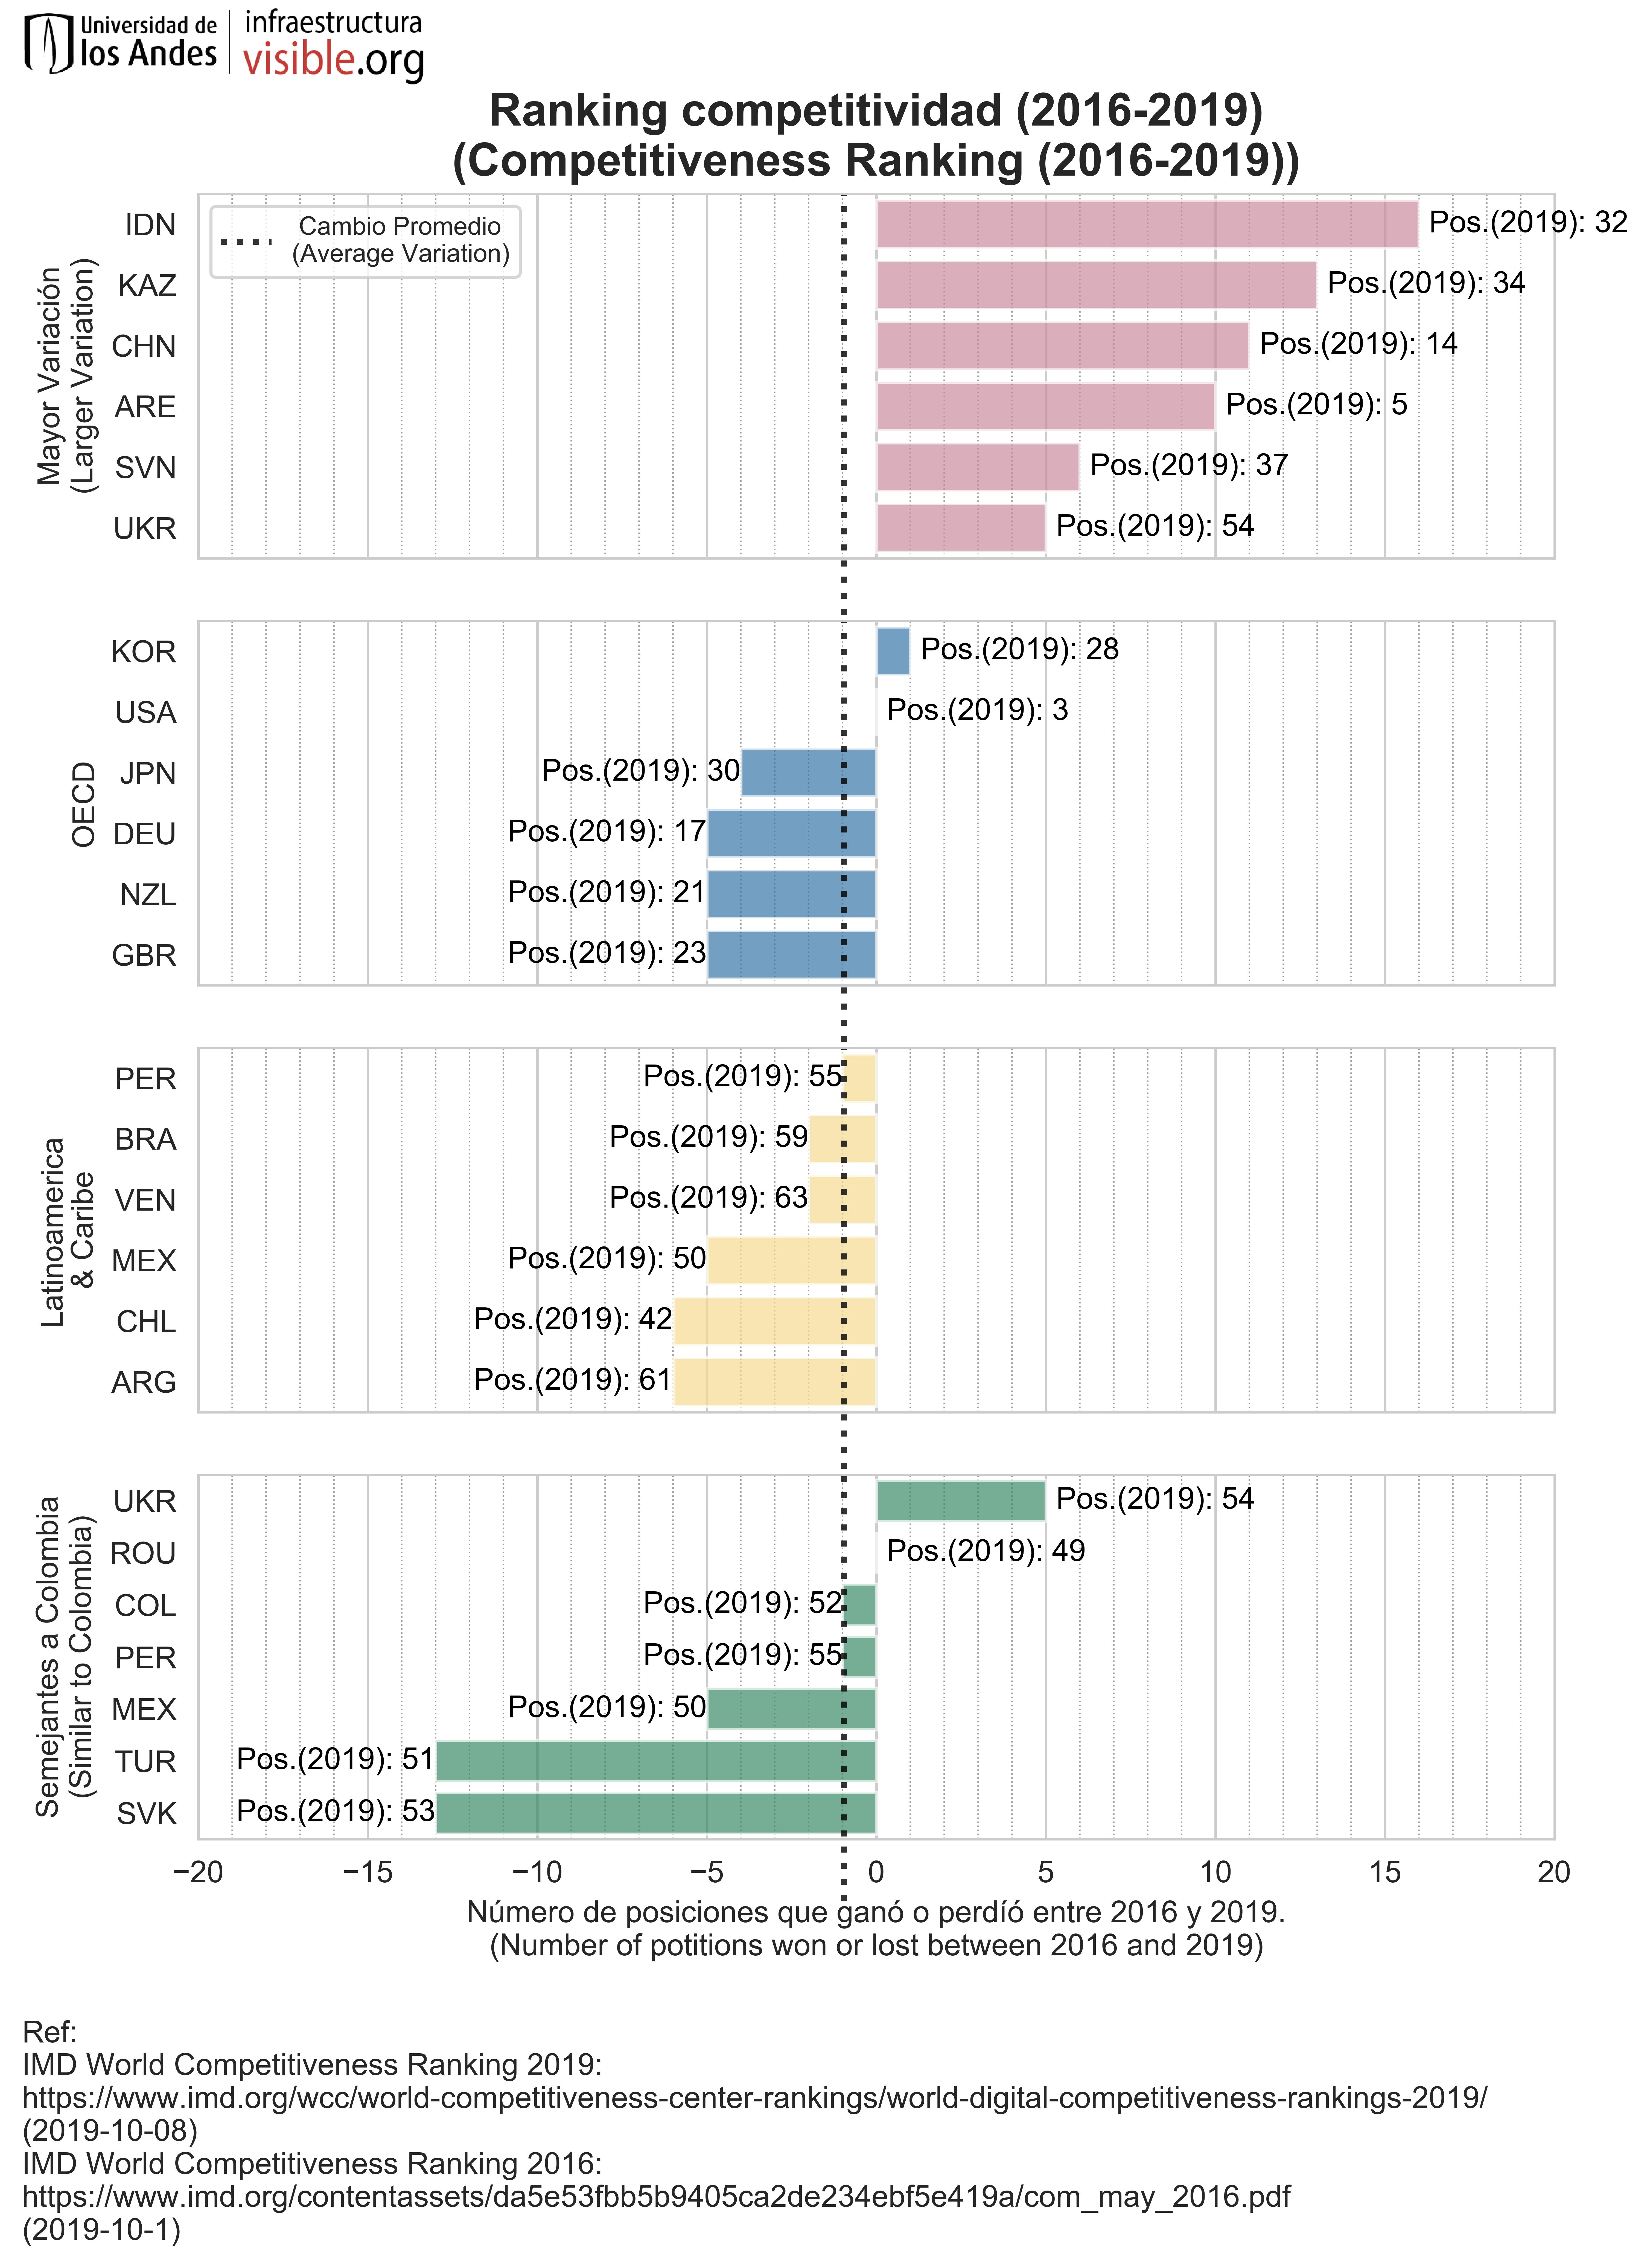 Ranking competitividad (2016-2019)